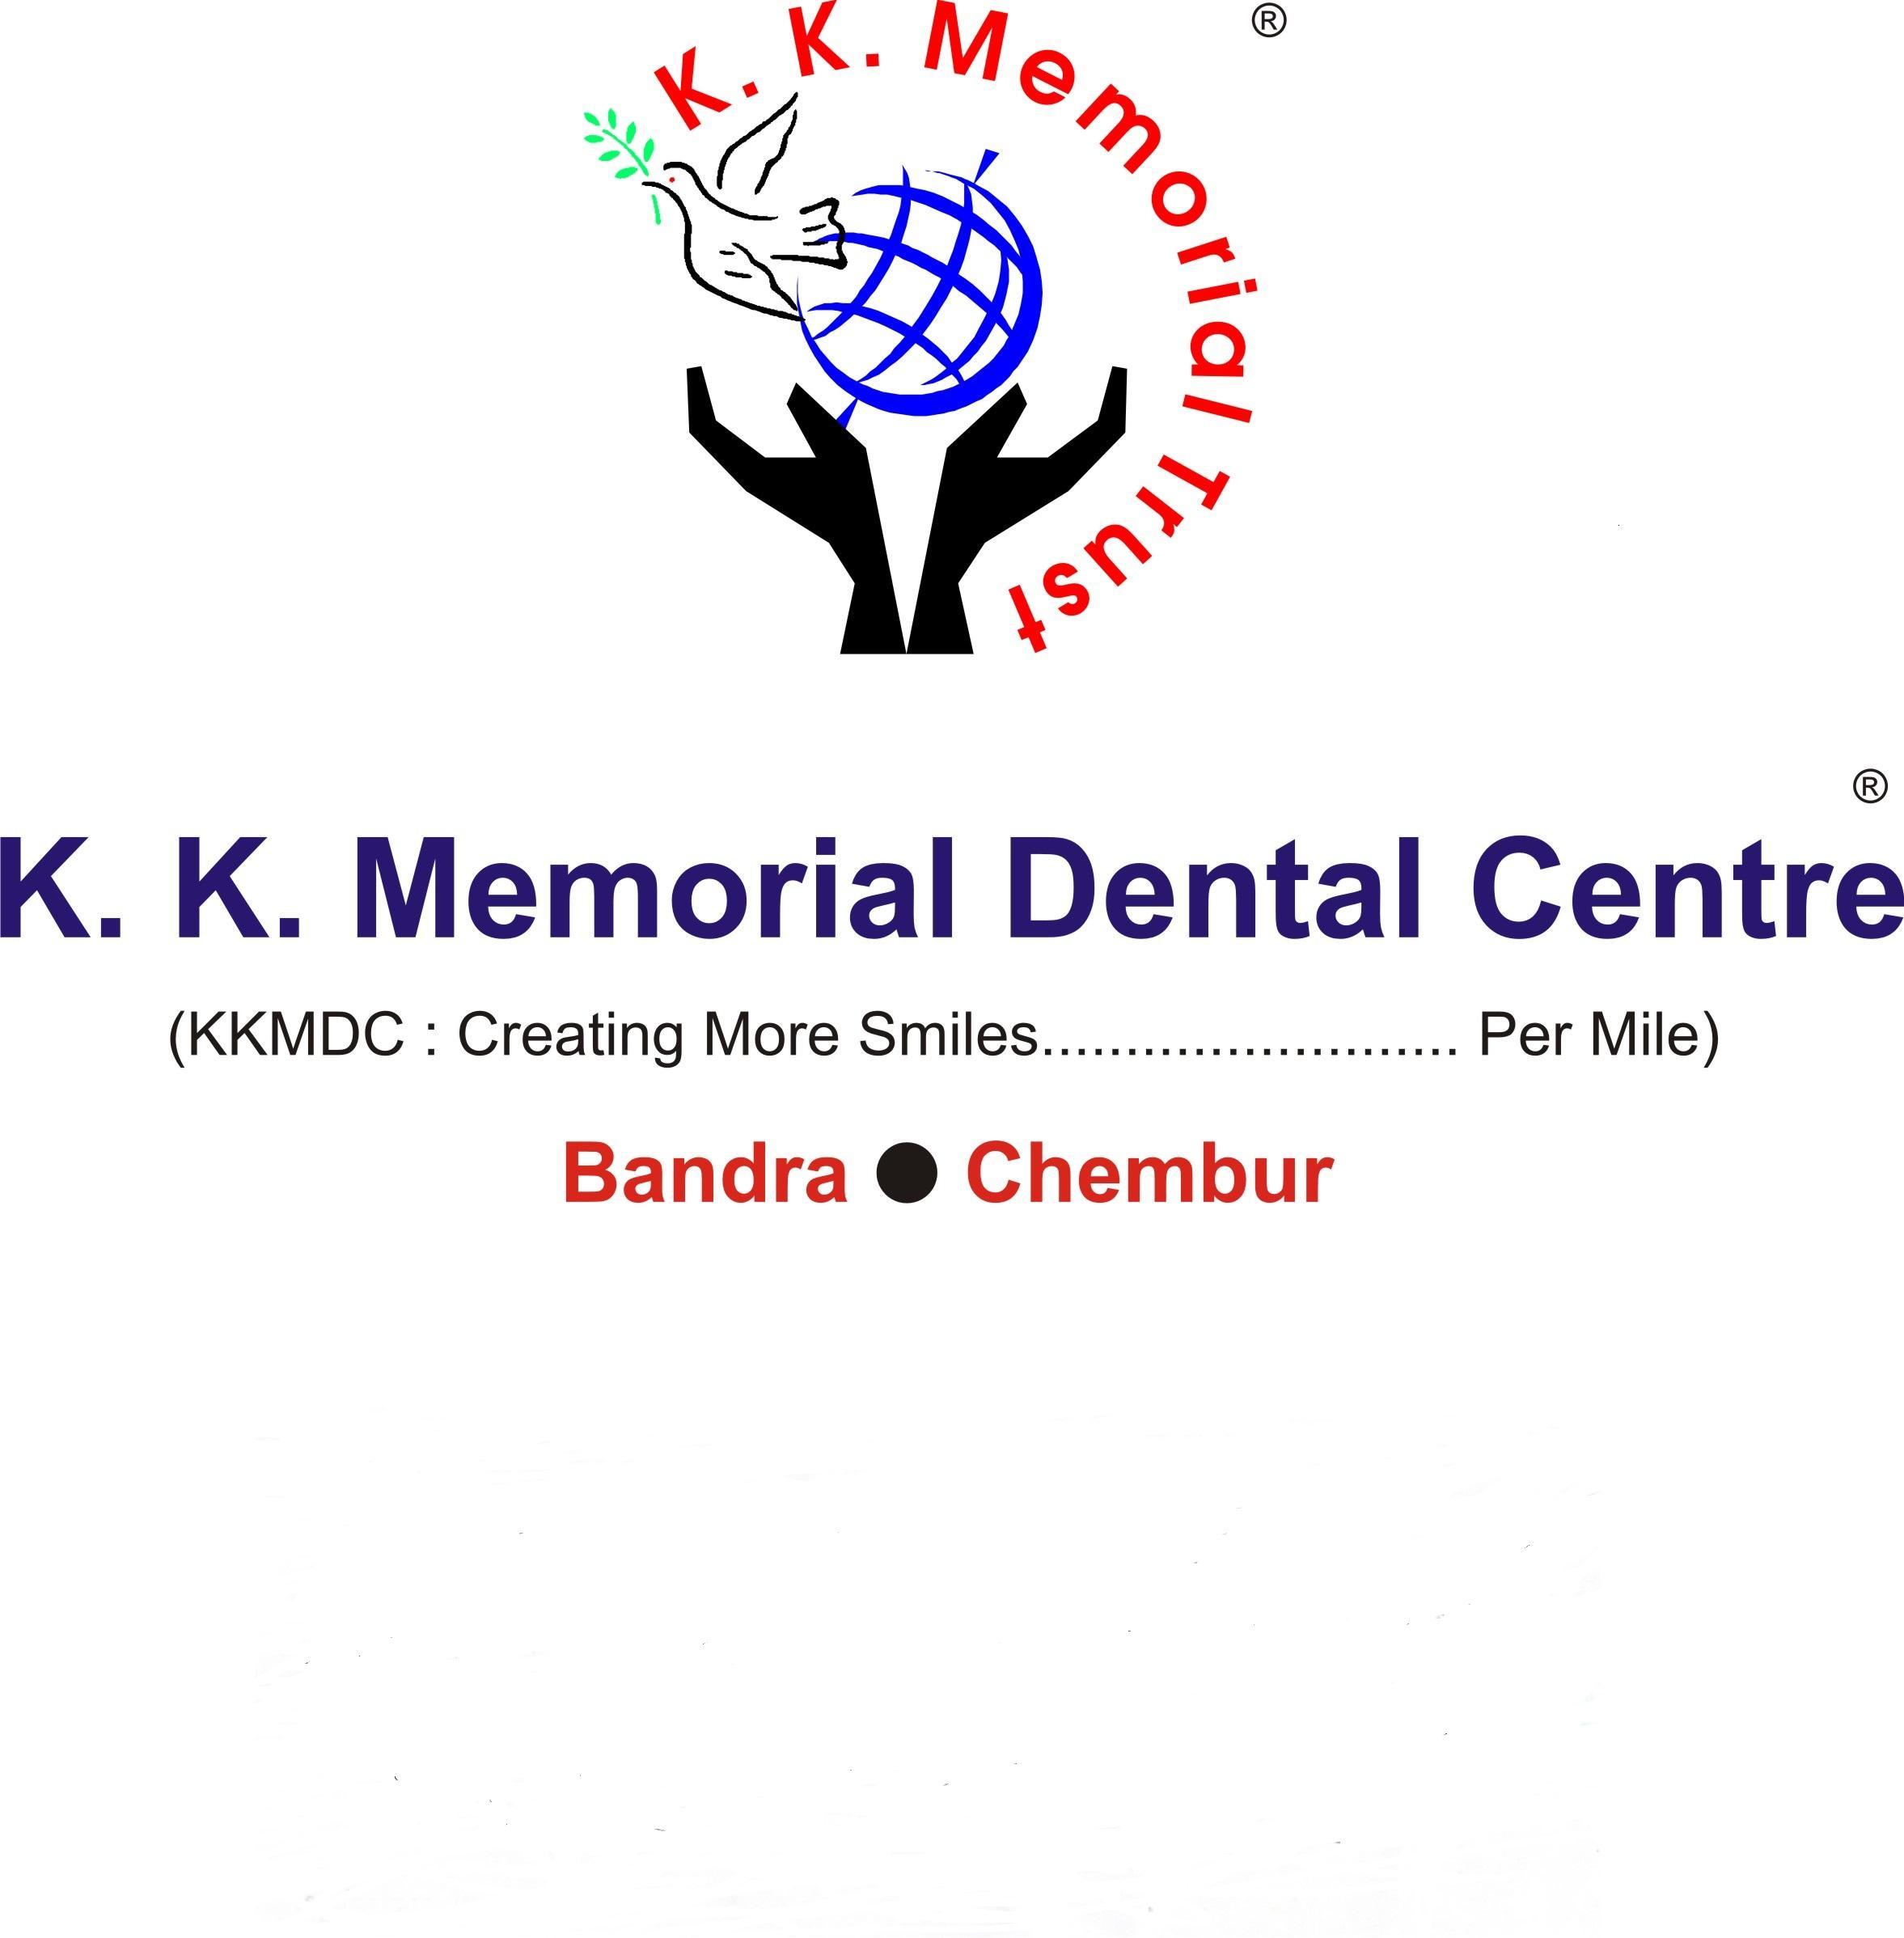 K. K. Memorial Dental Centre